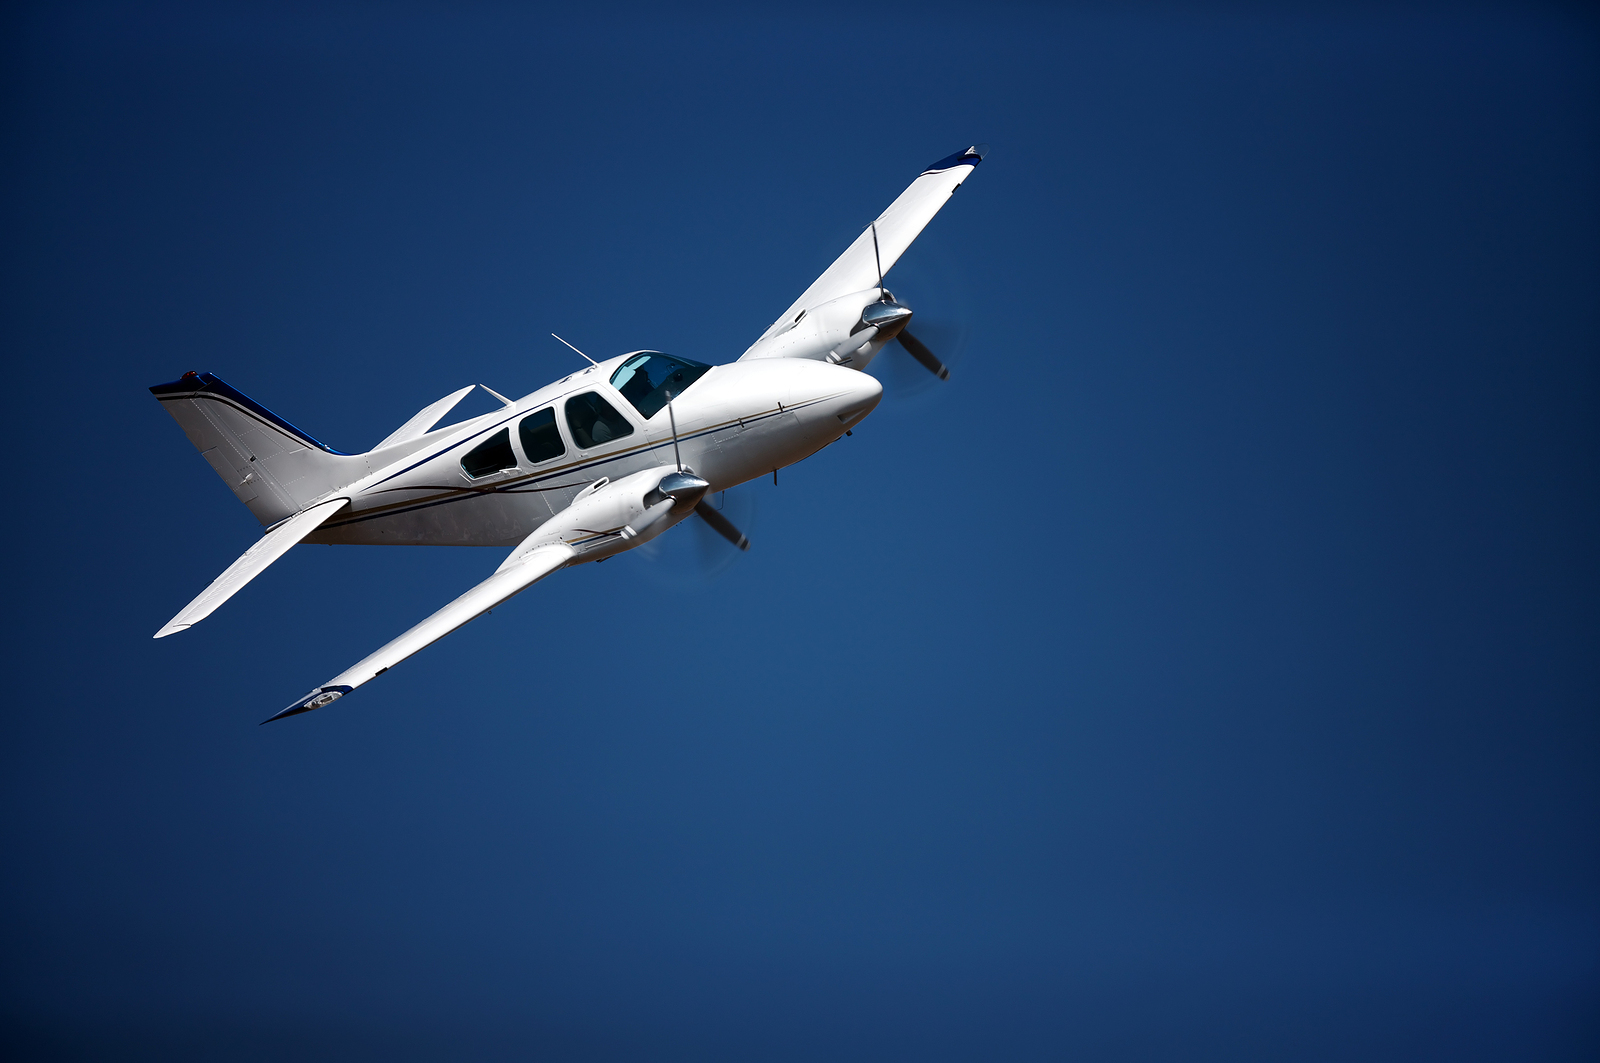 bigstock-Small-airplane-against-blue-sk-19414487.jpg